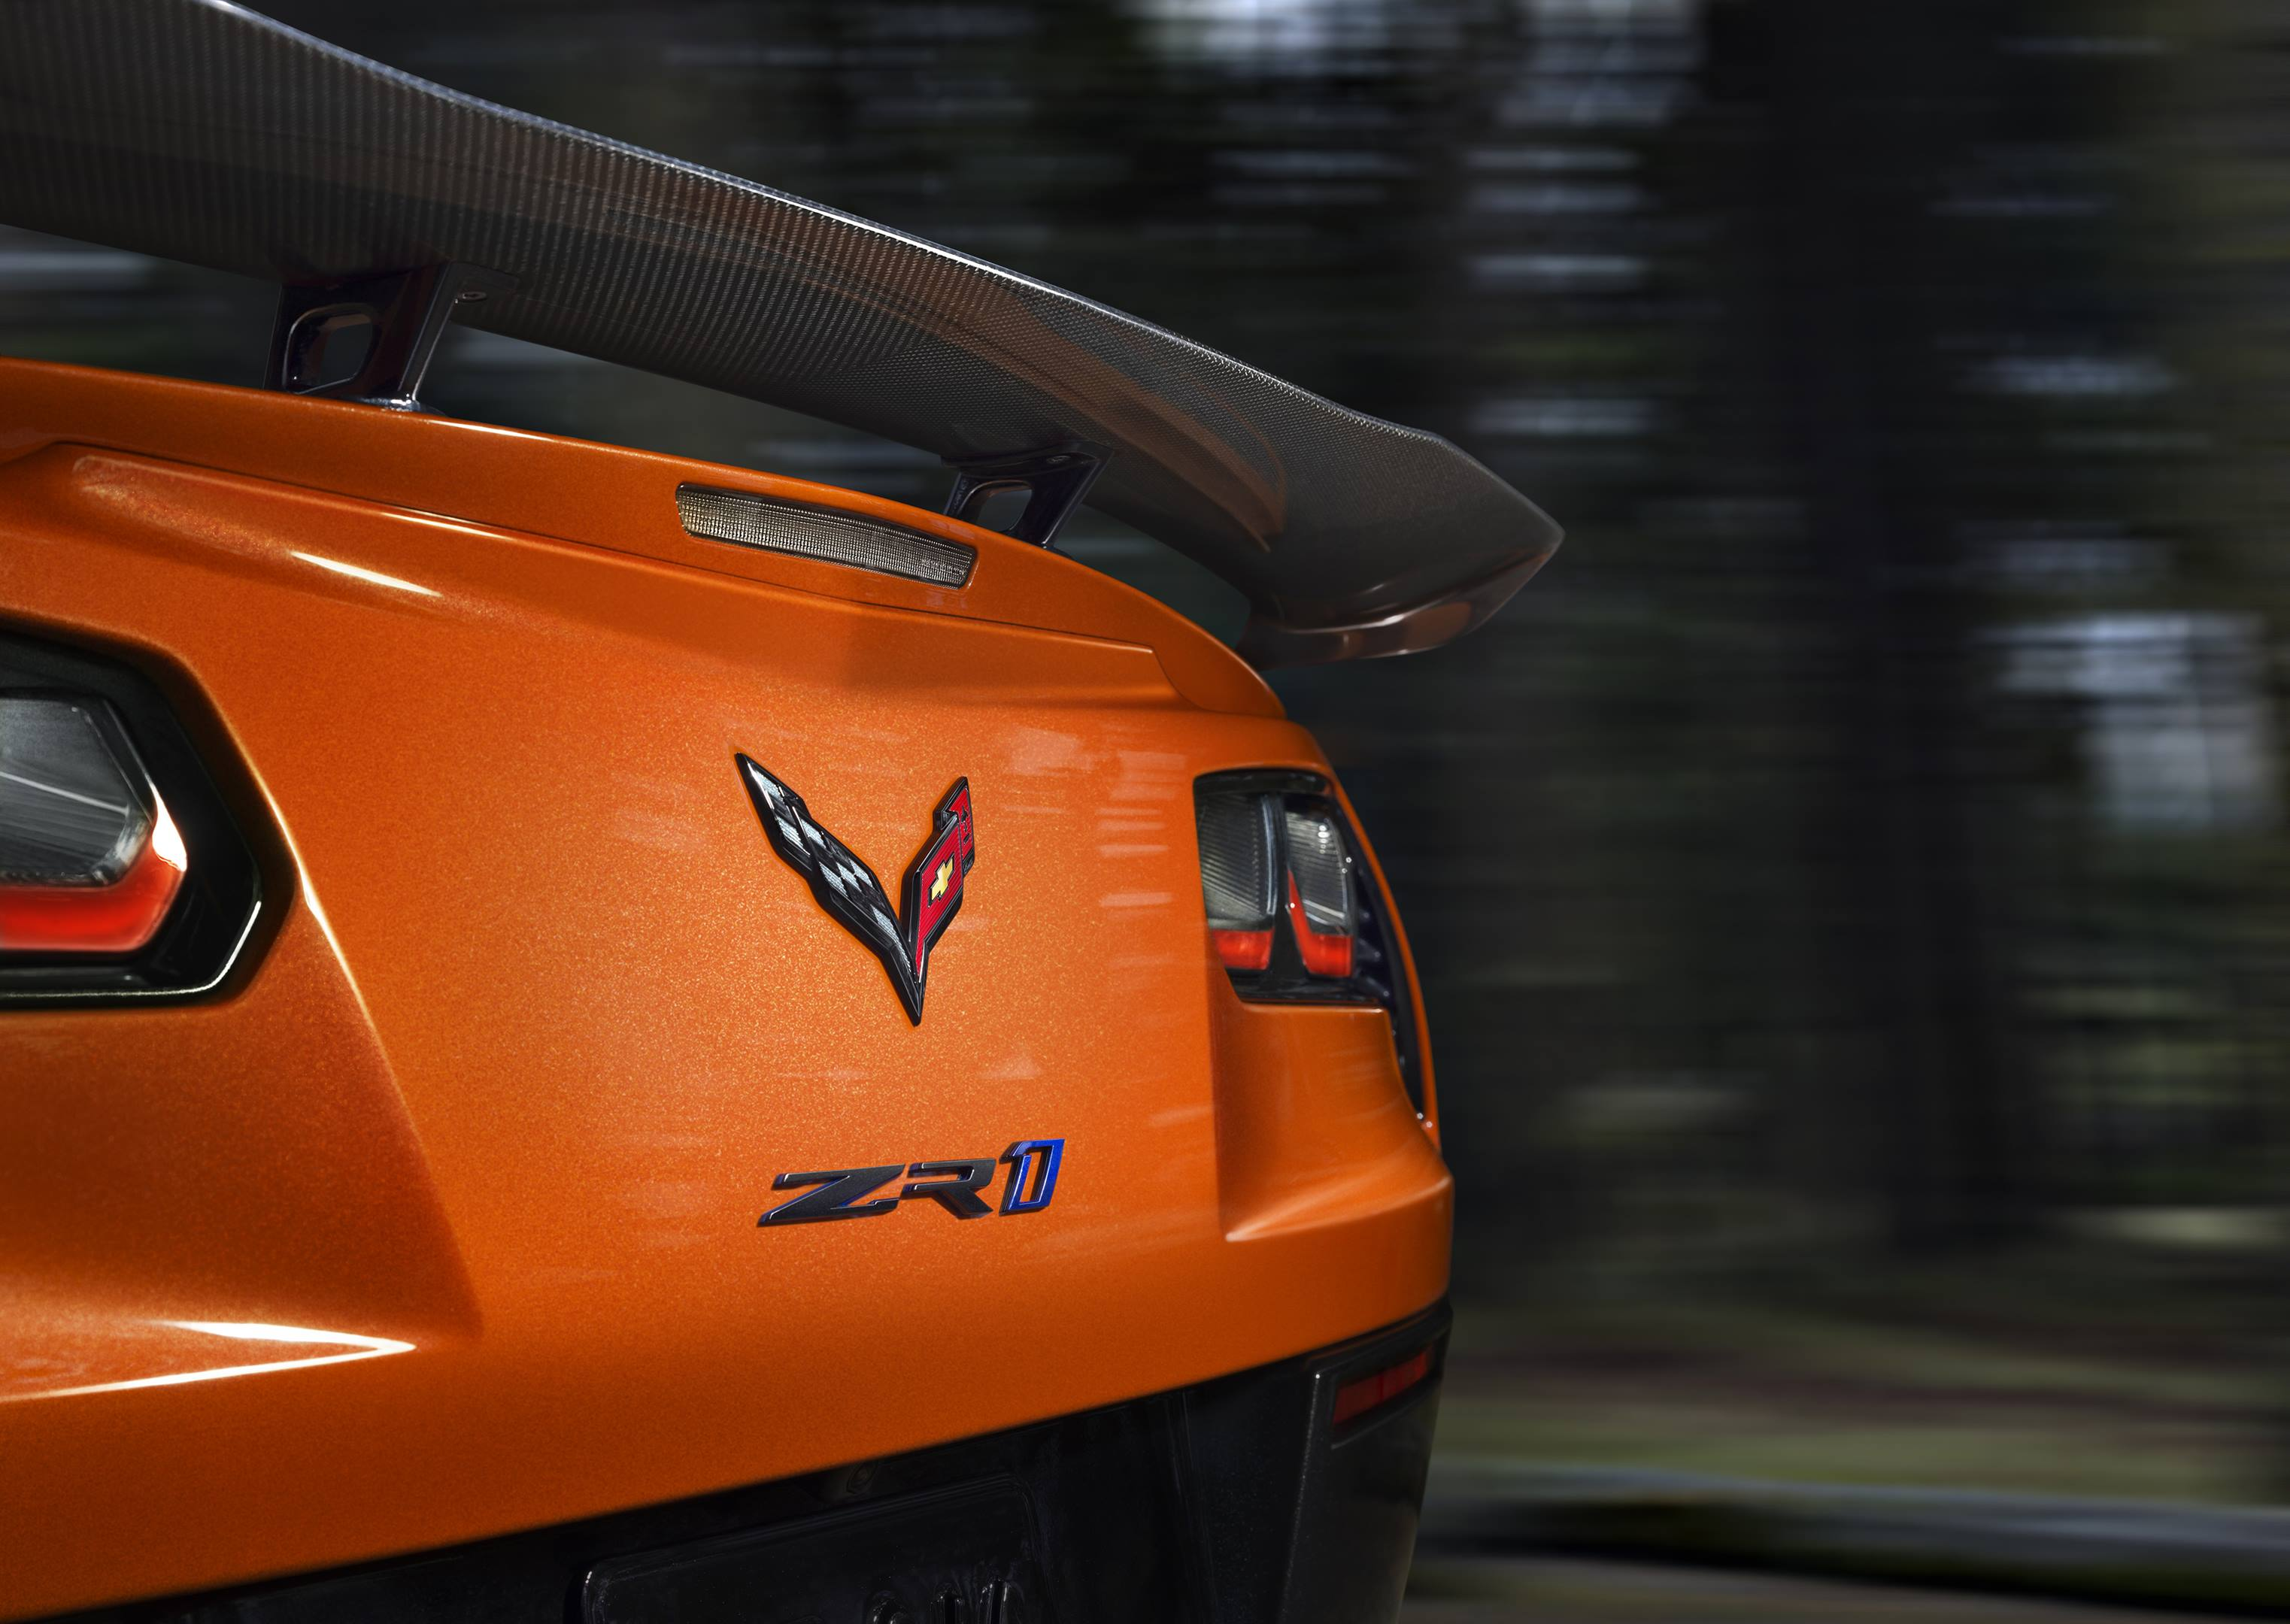 2019 Chevrolet Corvette ZR1 rear end detail shot